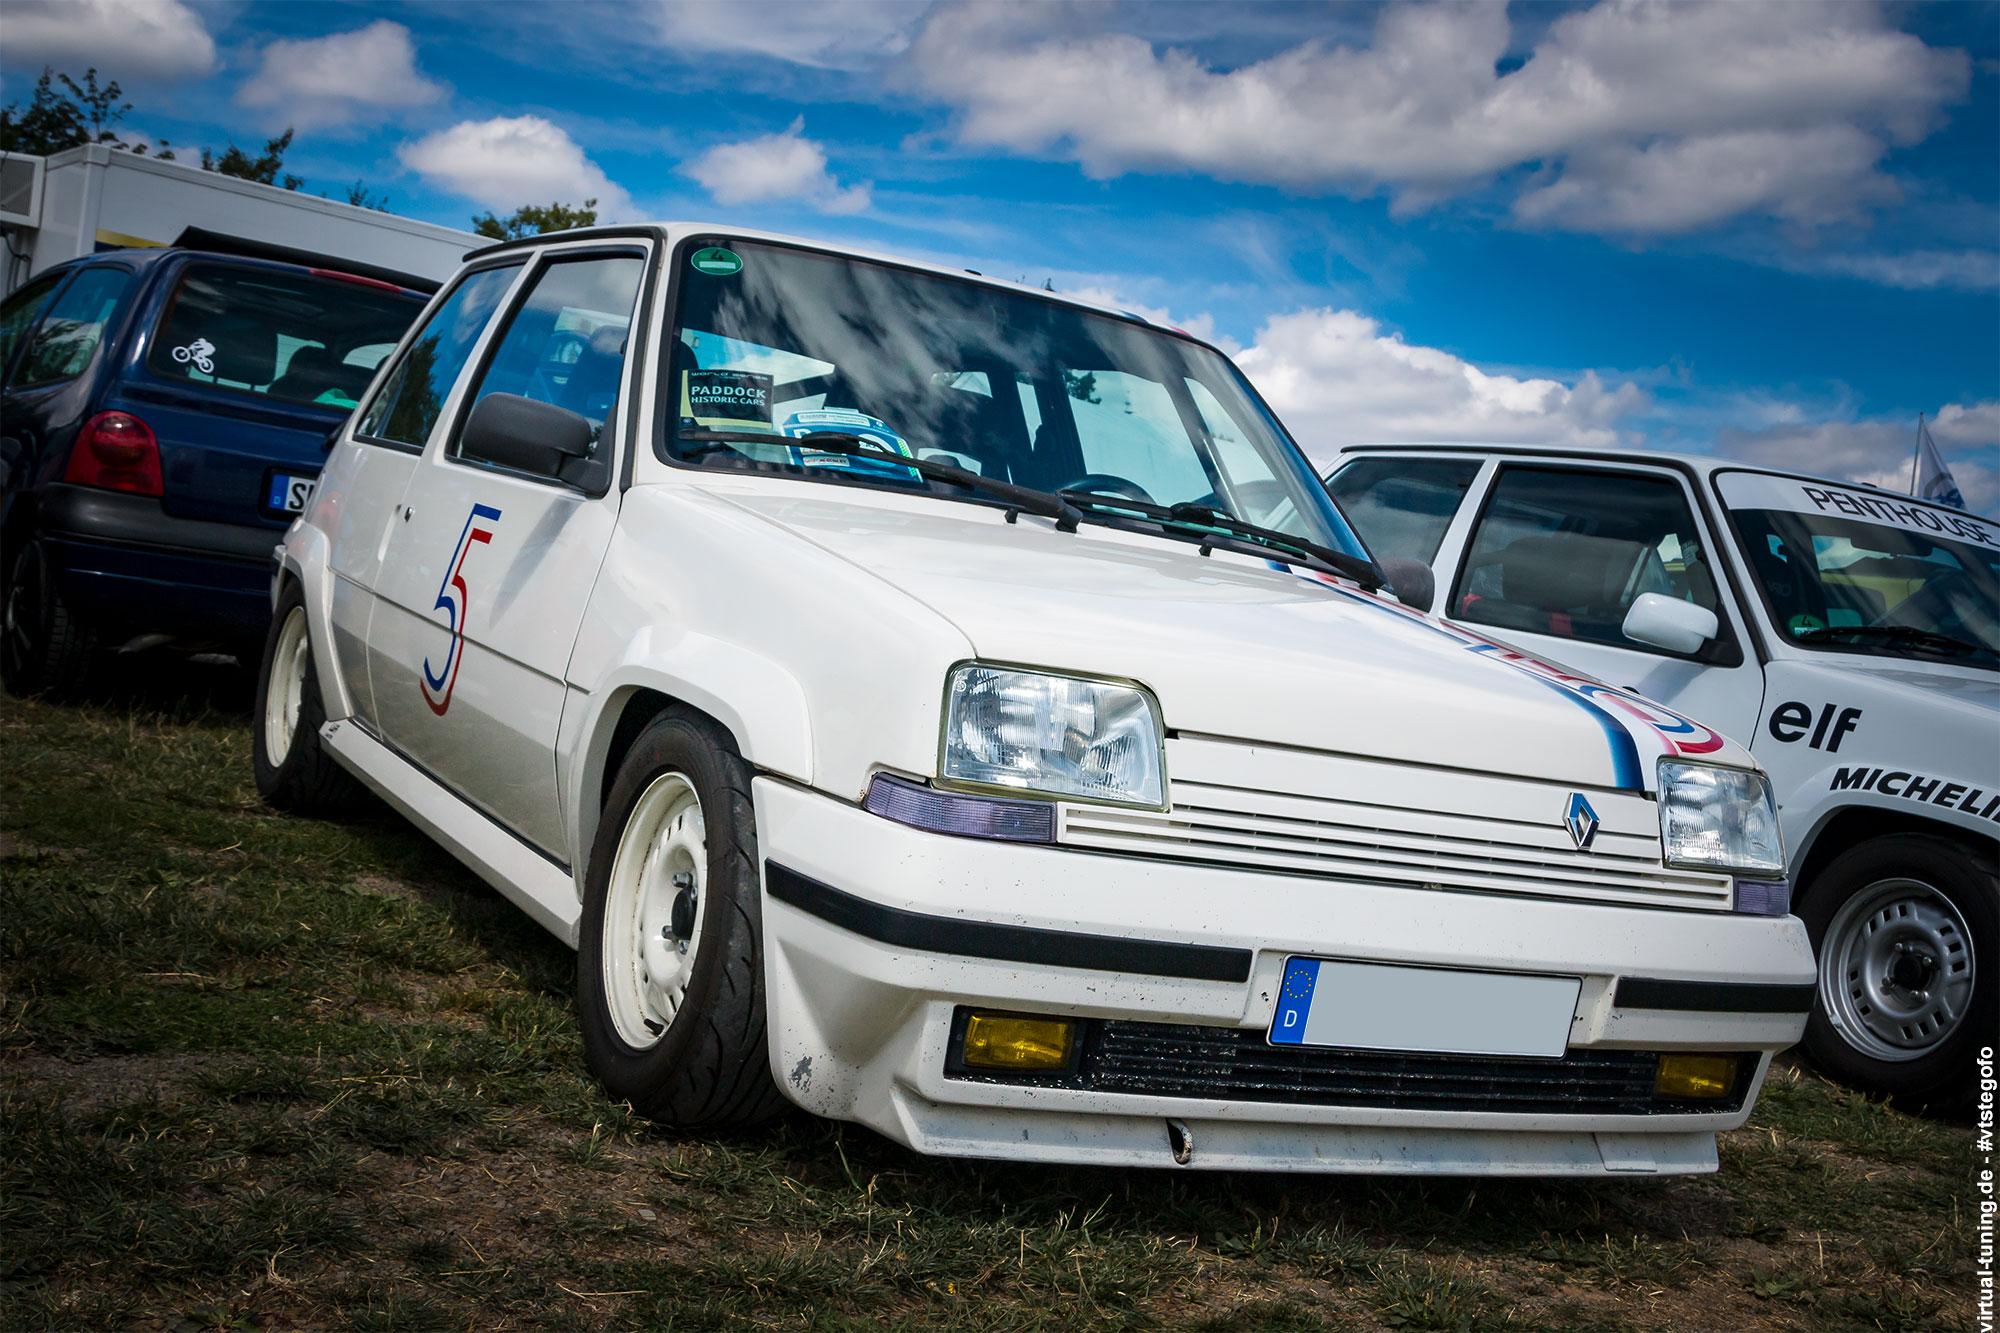 Renault 5 - D´ARC Sommertreffen 2018 am Nürburgring